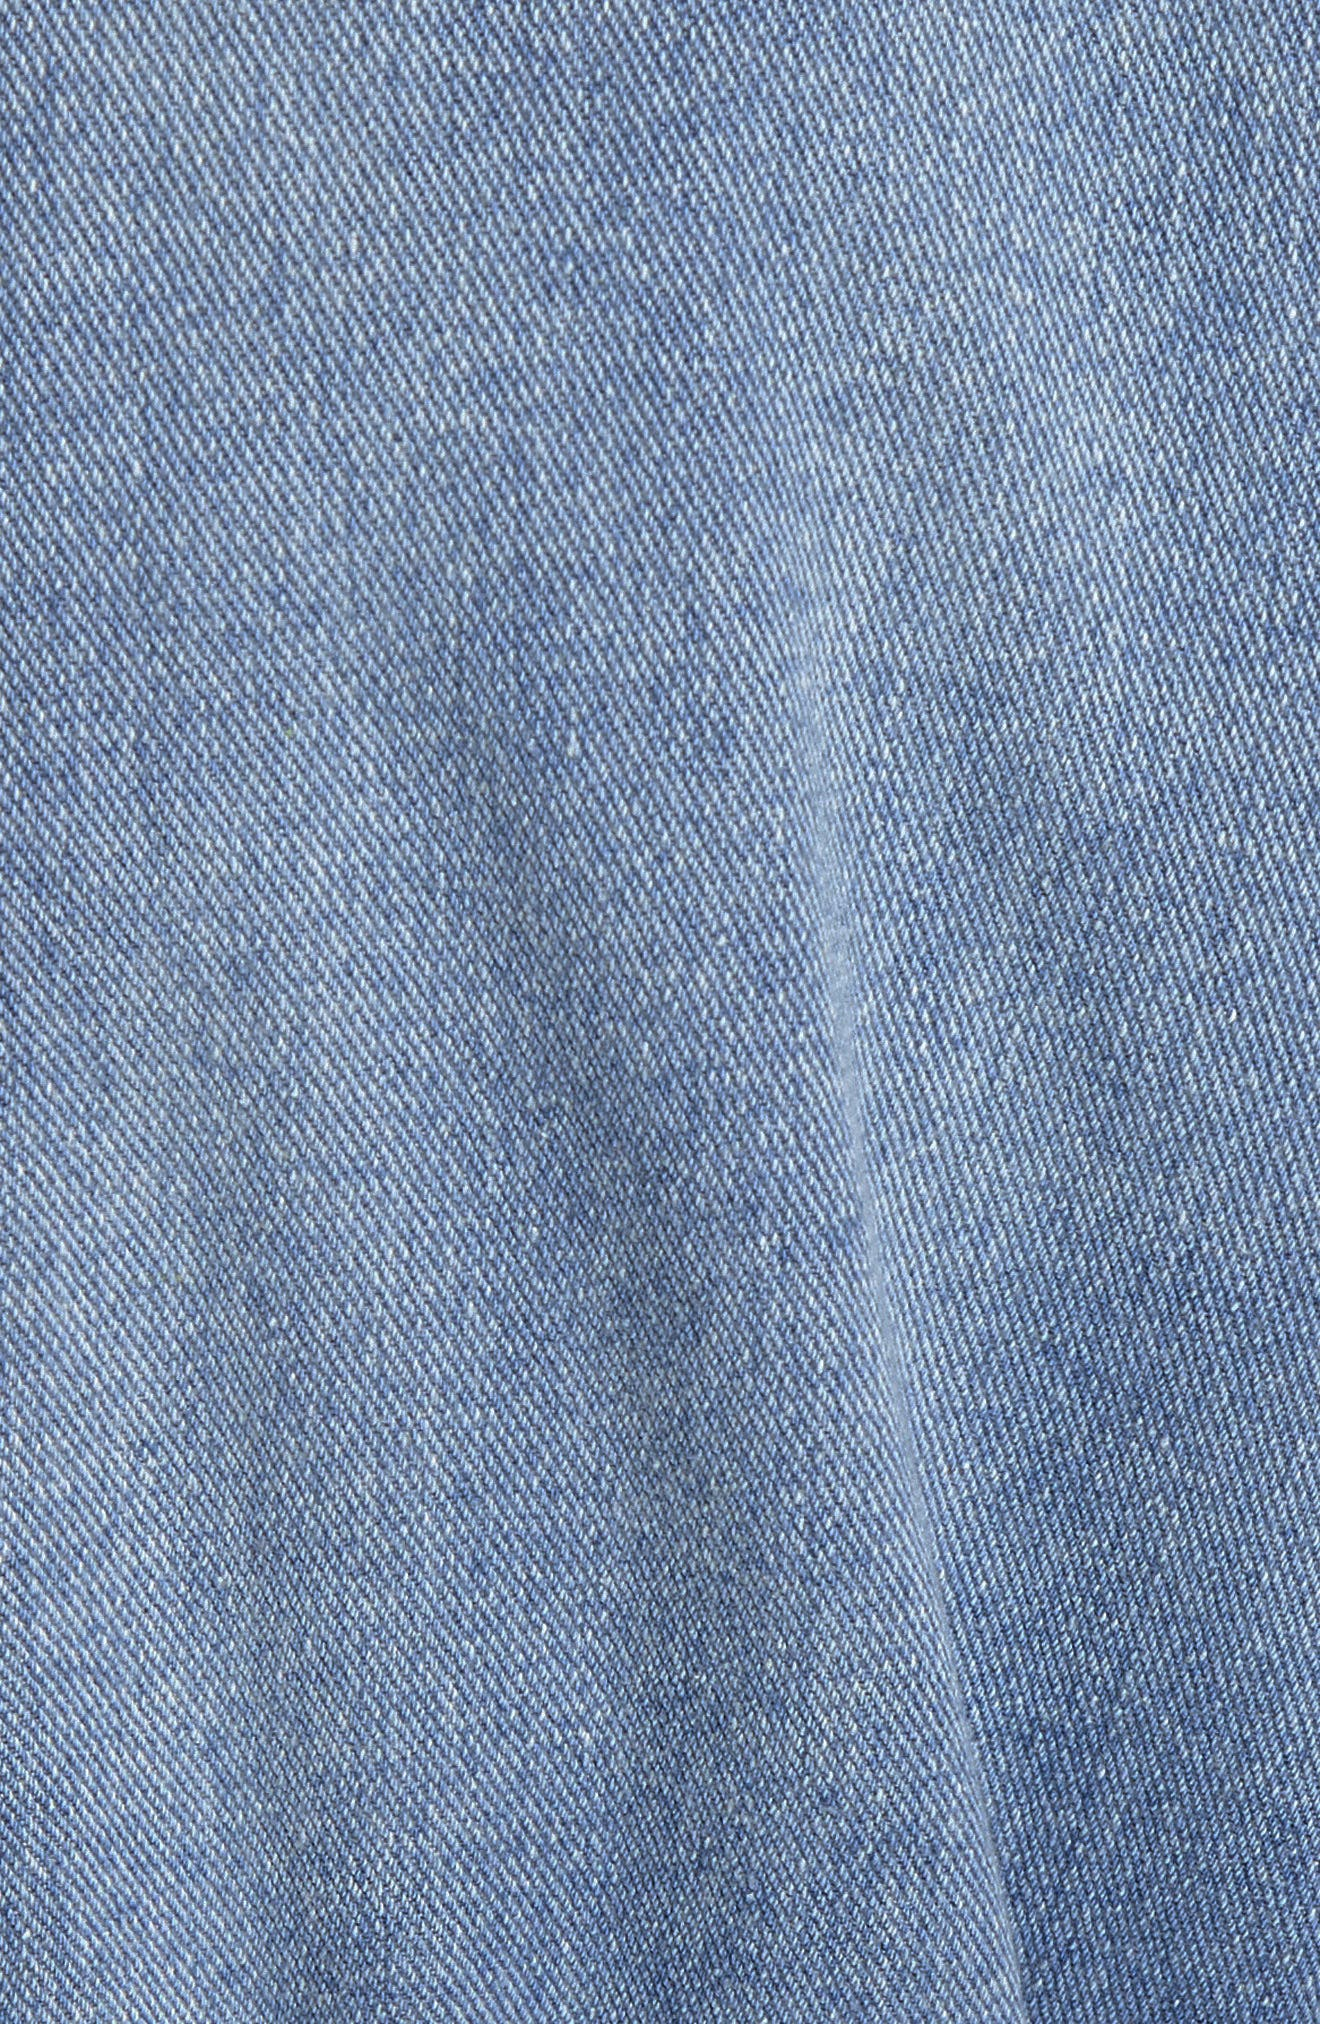 Denim Trench Coat,                             Alternate thumbnail 5, color,                             420